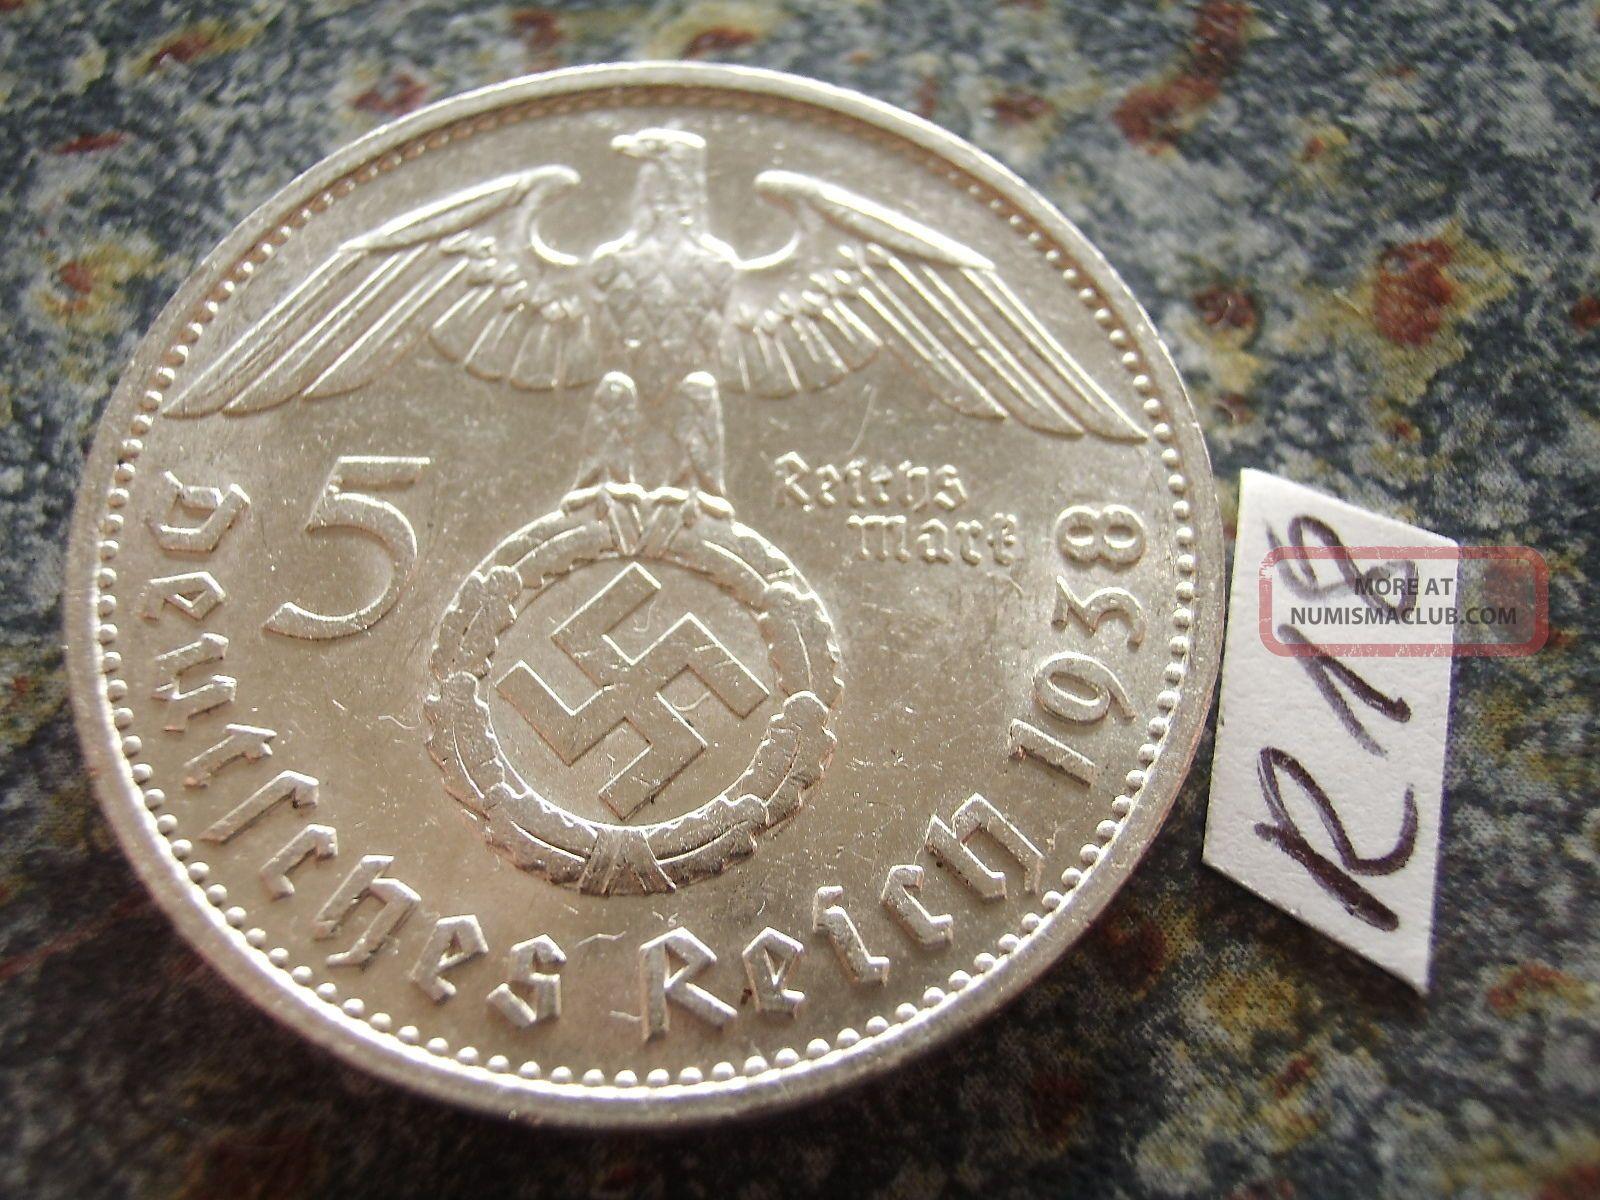 1938 G Third Reich 5 Mark Silver Swastika Eagle / Earl Hindenburg Reichsmark Germany photo